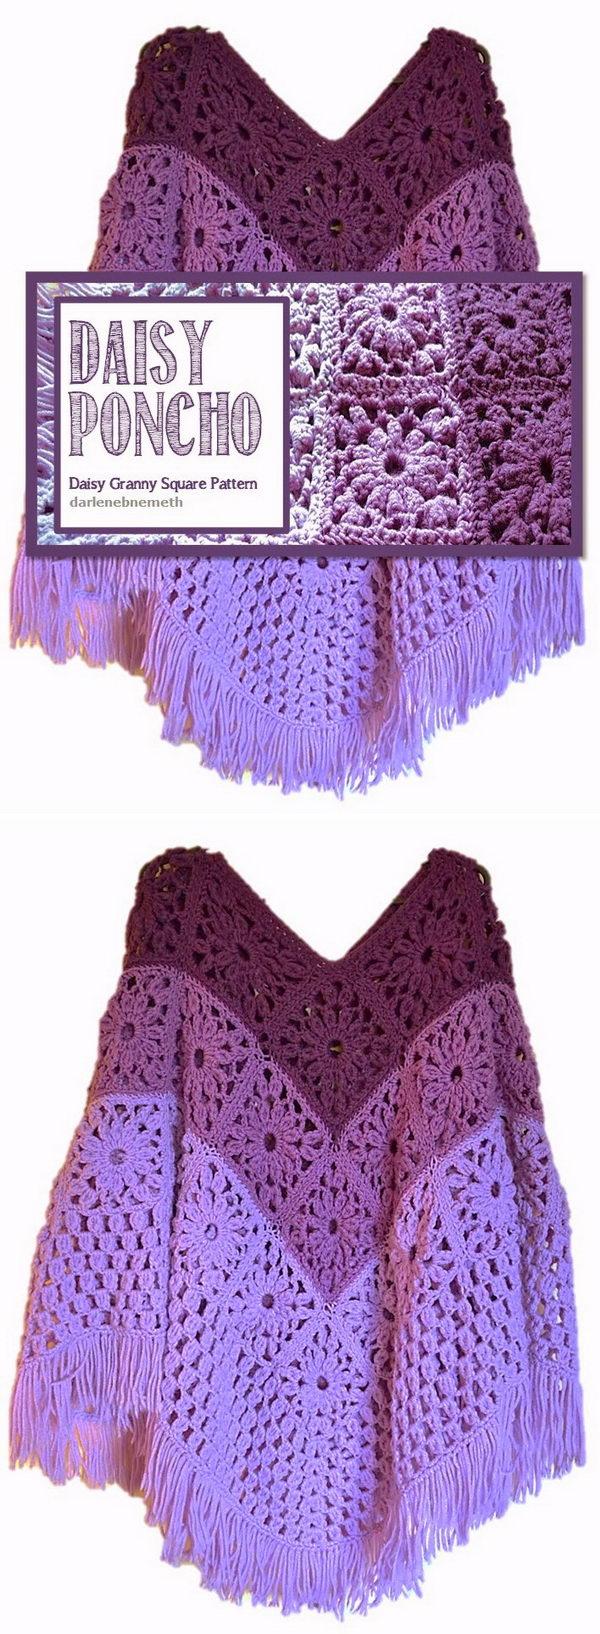 18 crochet women capes poncho ideas - 20 Crochet Women Capes and Poncho Ideas